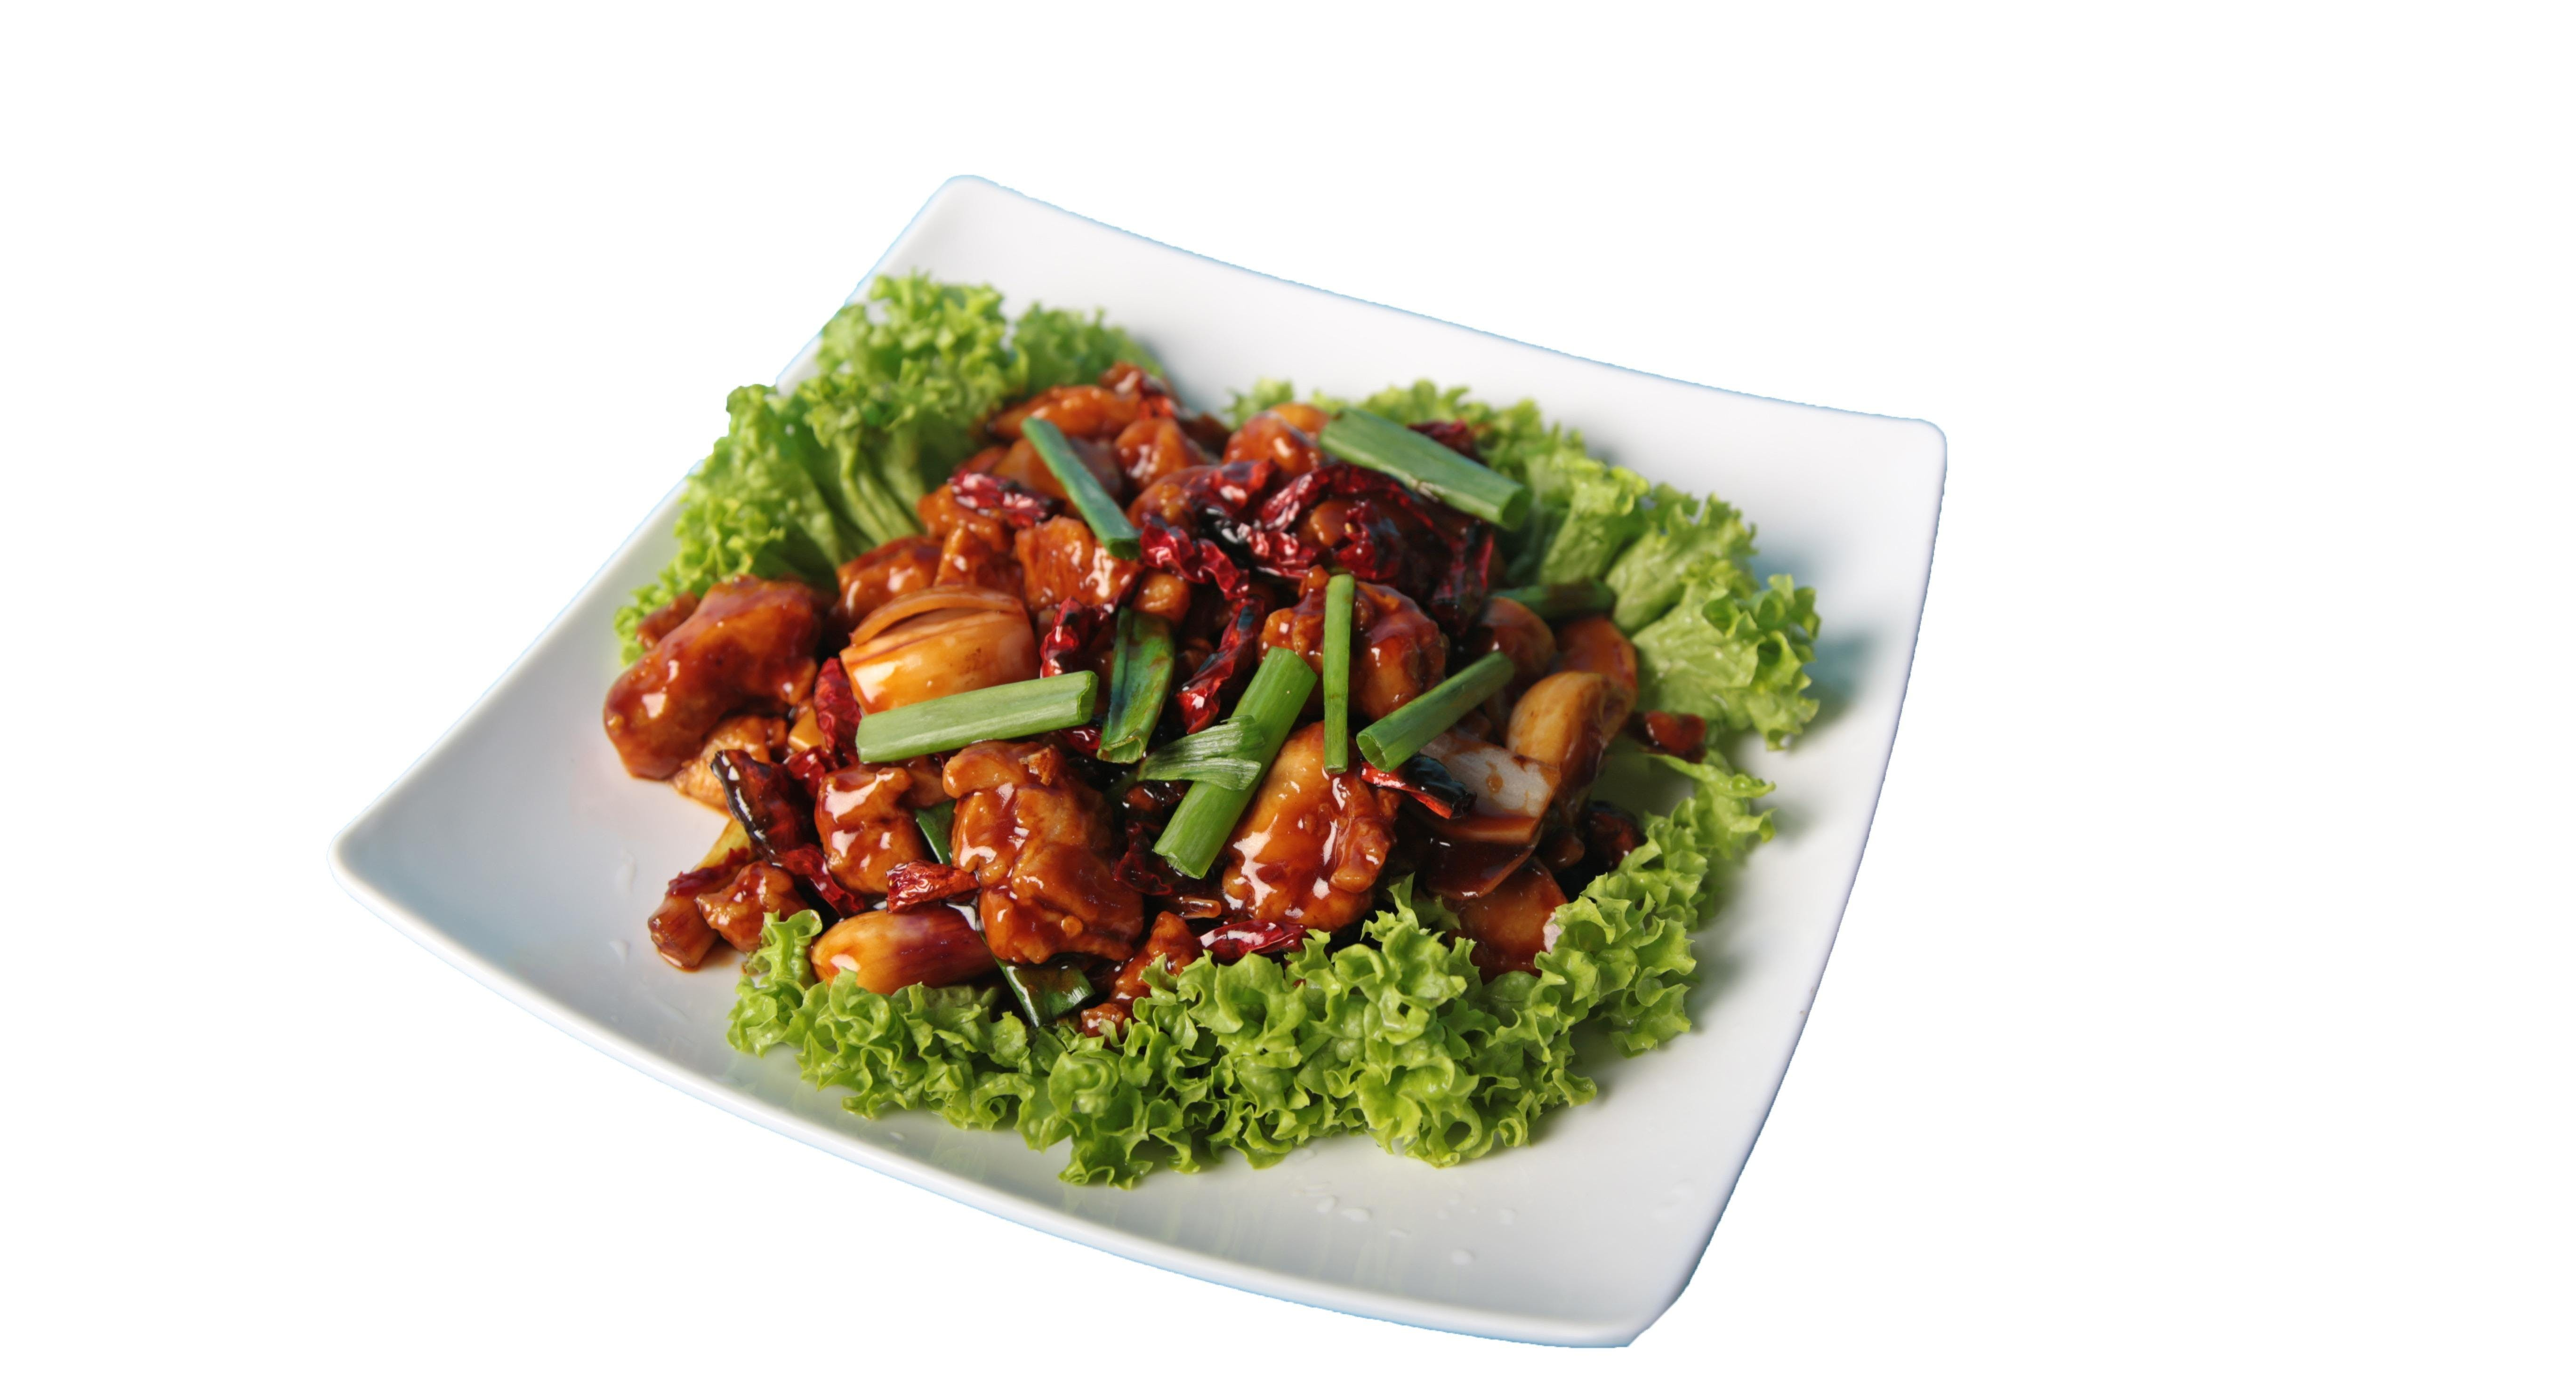 Xin Lai Lai Seafood Restaurant 新來來海鮮館